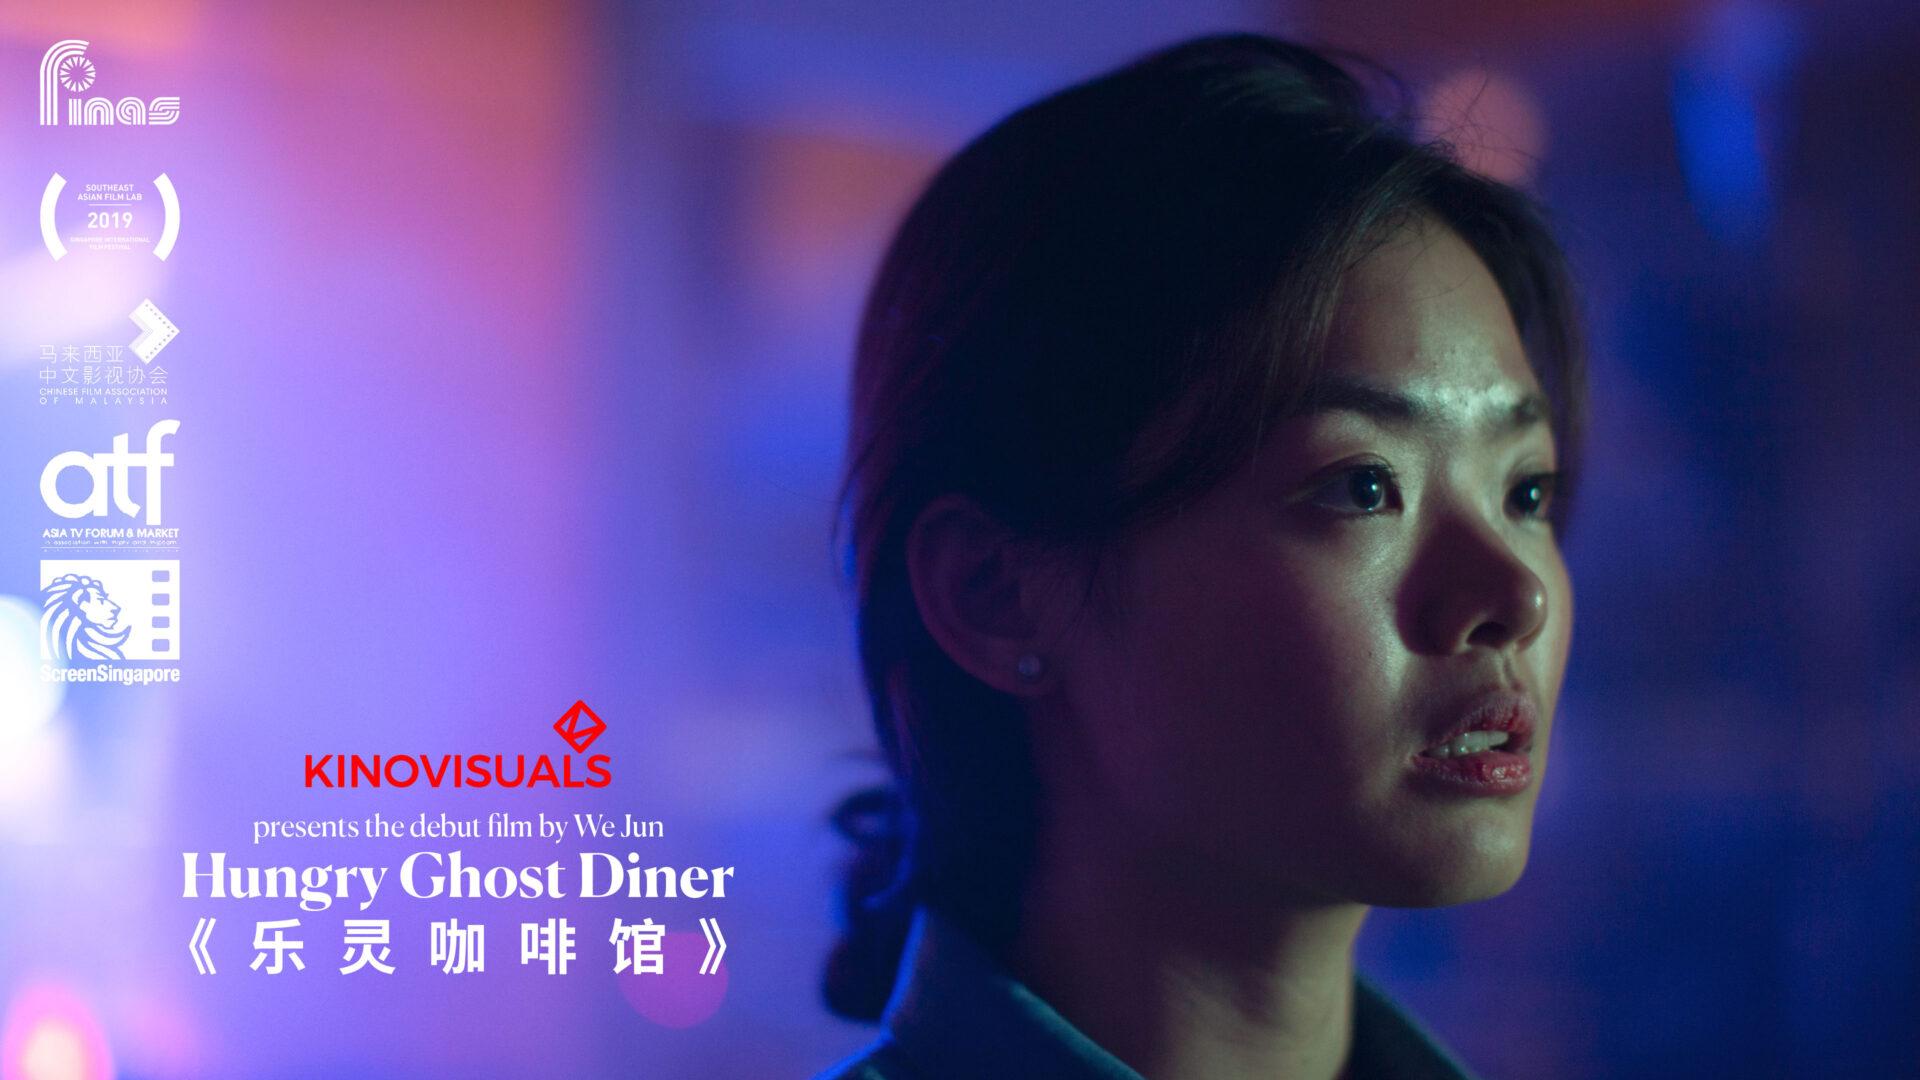 Hungry Ghost Diner《乐灵咖啡馆》 by We Jun